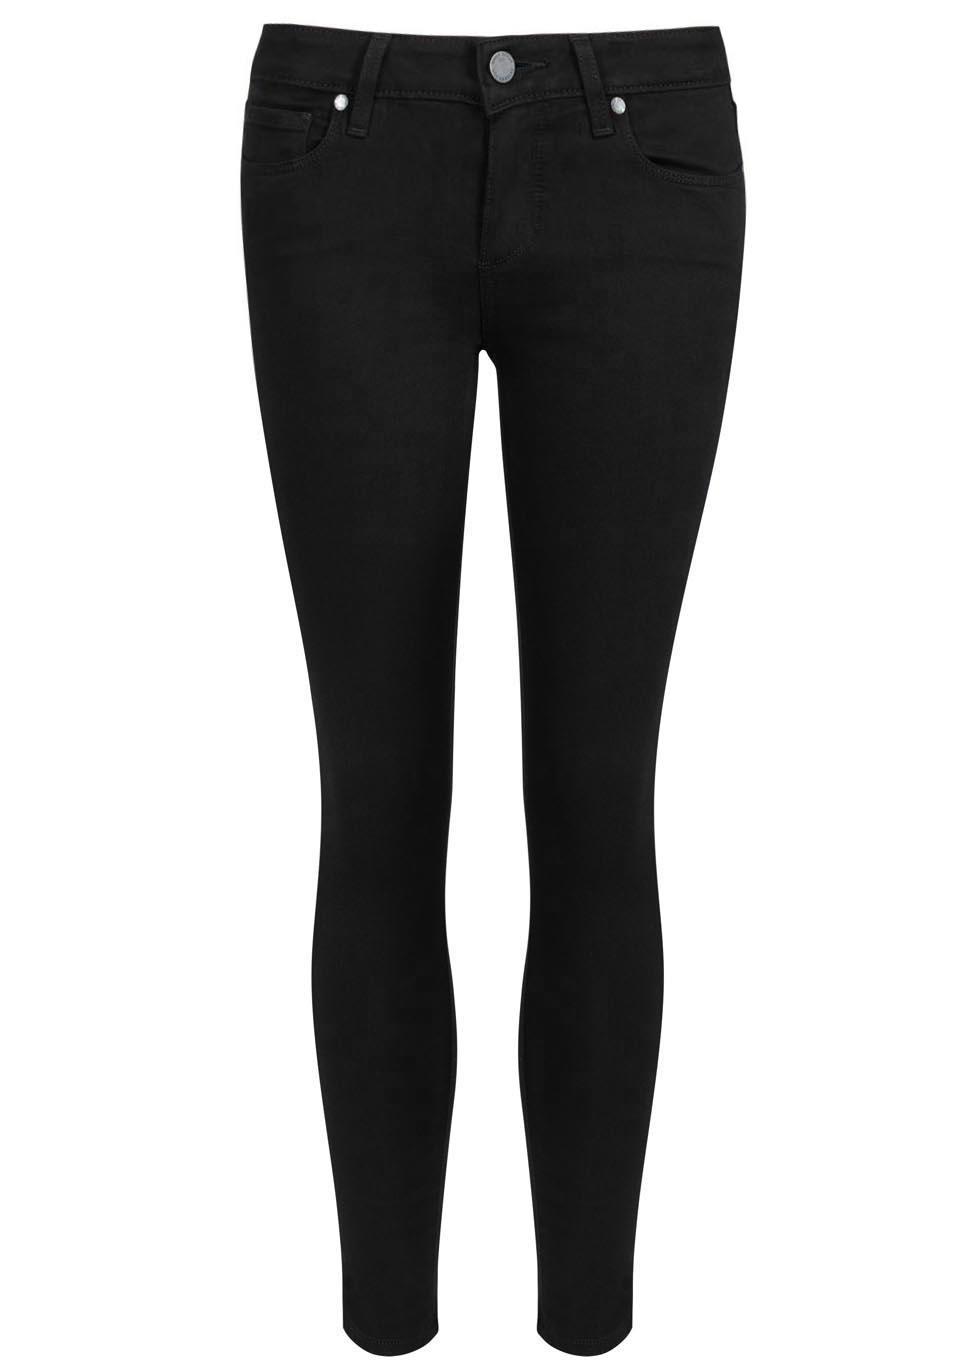 Verdugo Transcend skinny jeans - Paige